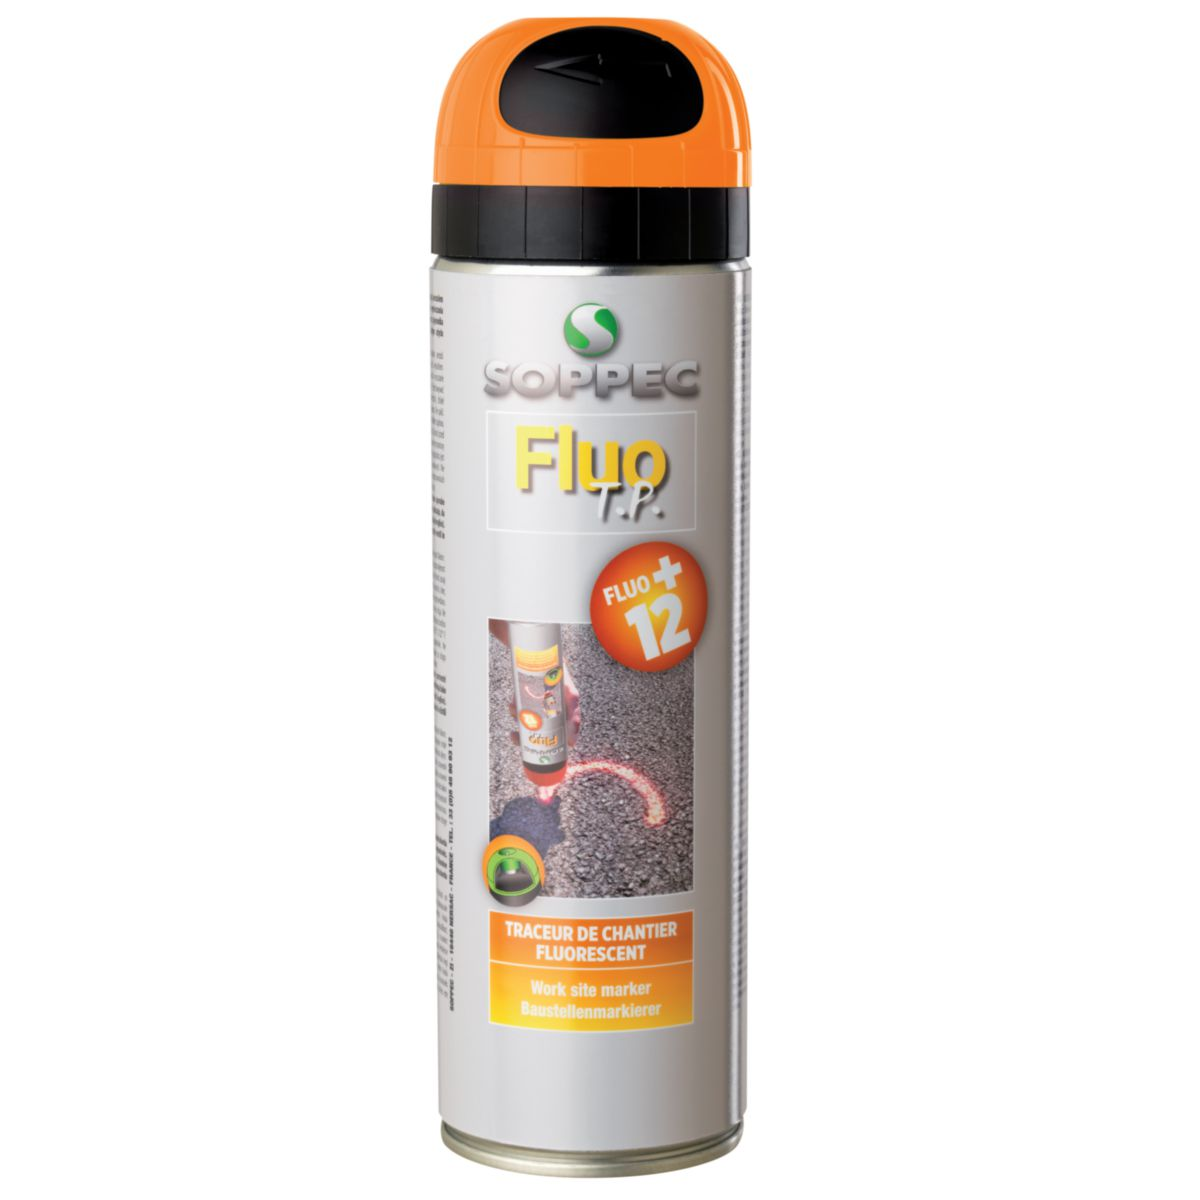 Bombe marquage sol traceurs de chantier fluorecents for Bombe de peinture castorama